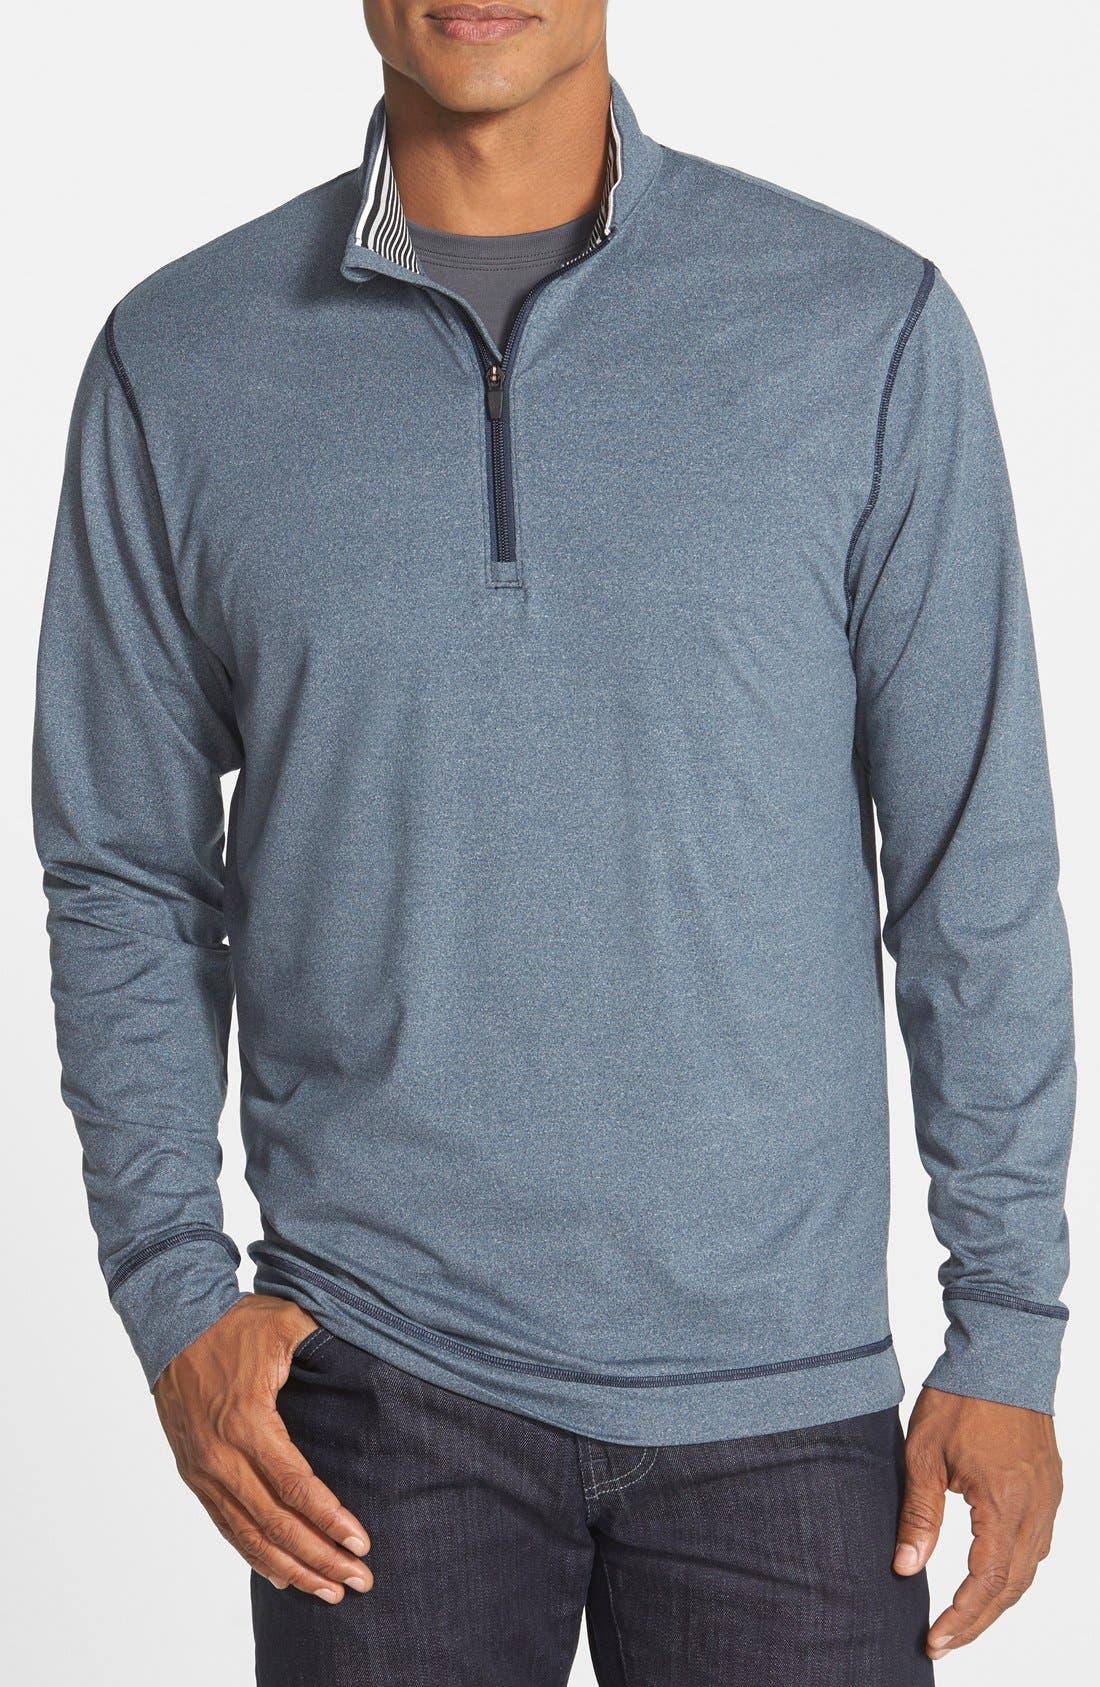 Cutter & Buck 'Topspin' DryTec Half Zip Pullover (Online Only)